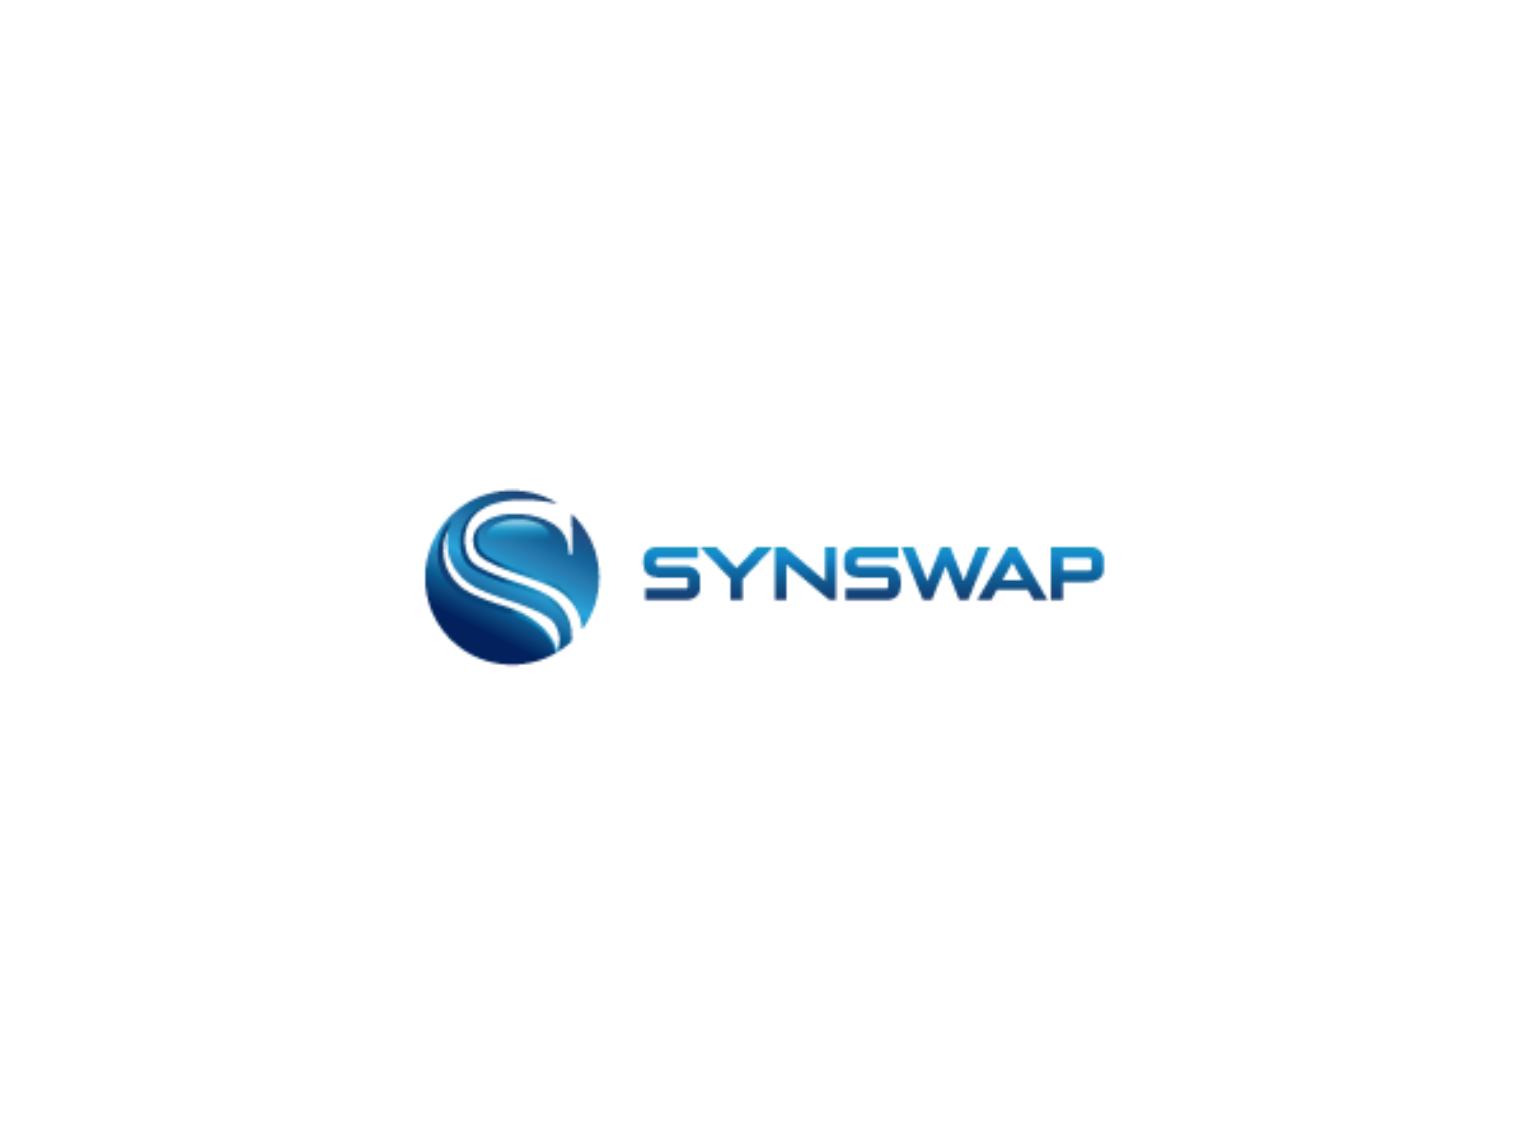 Synswap